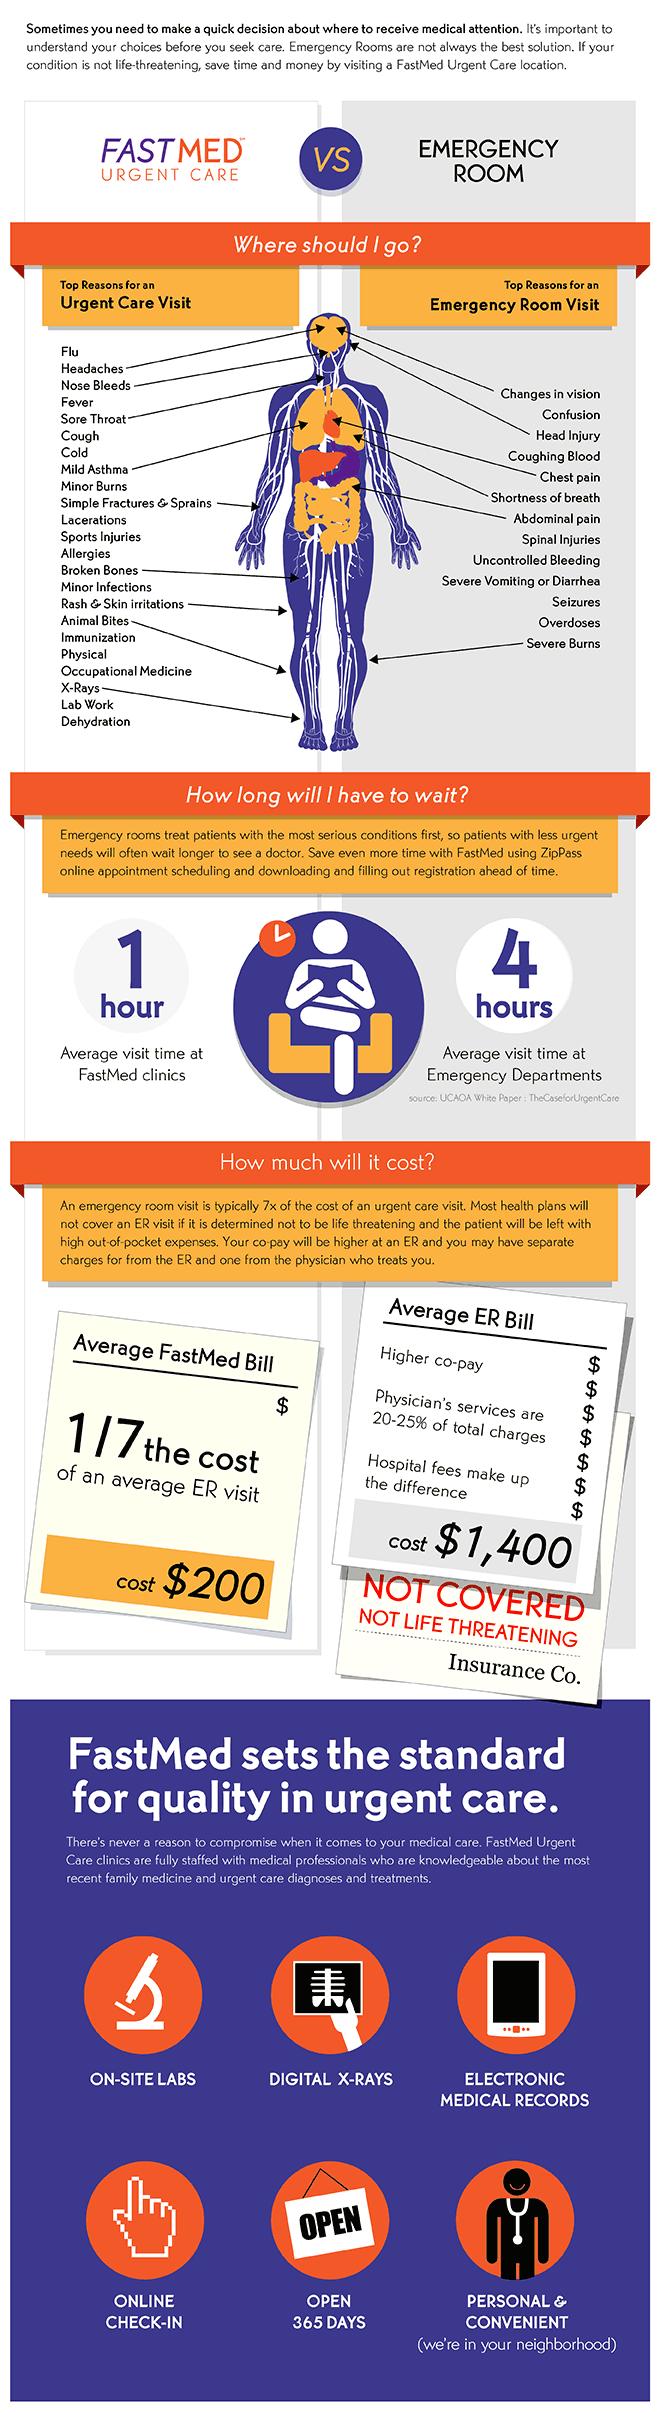 Urgent Care versus the Emergency Room